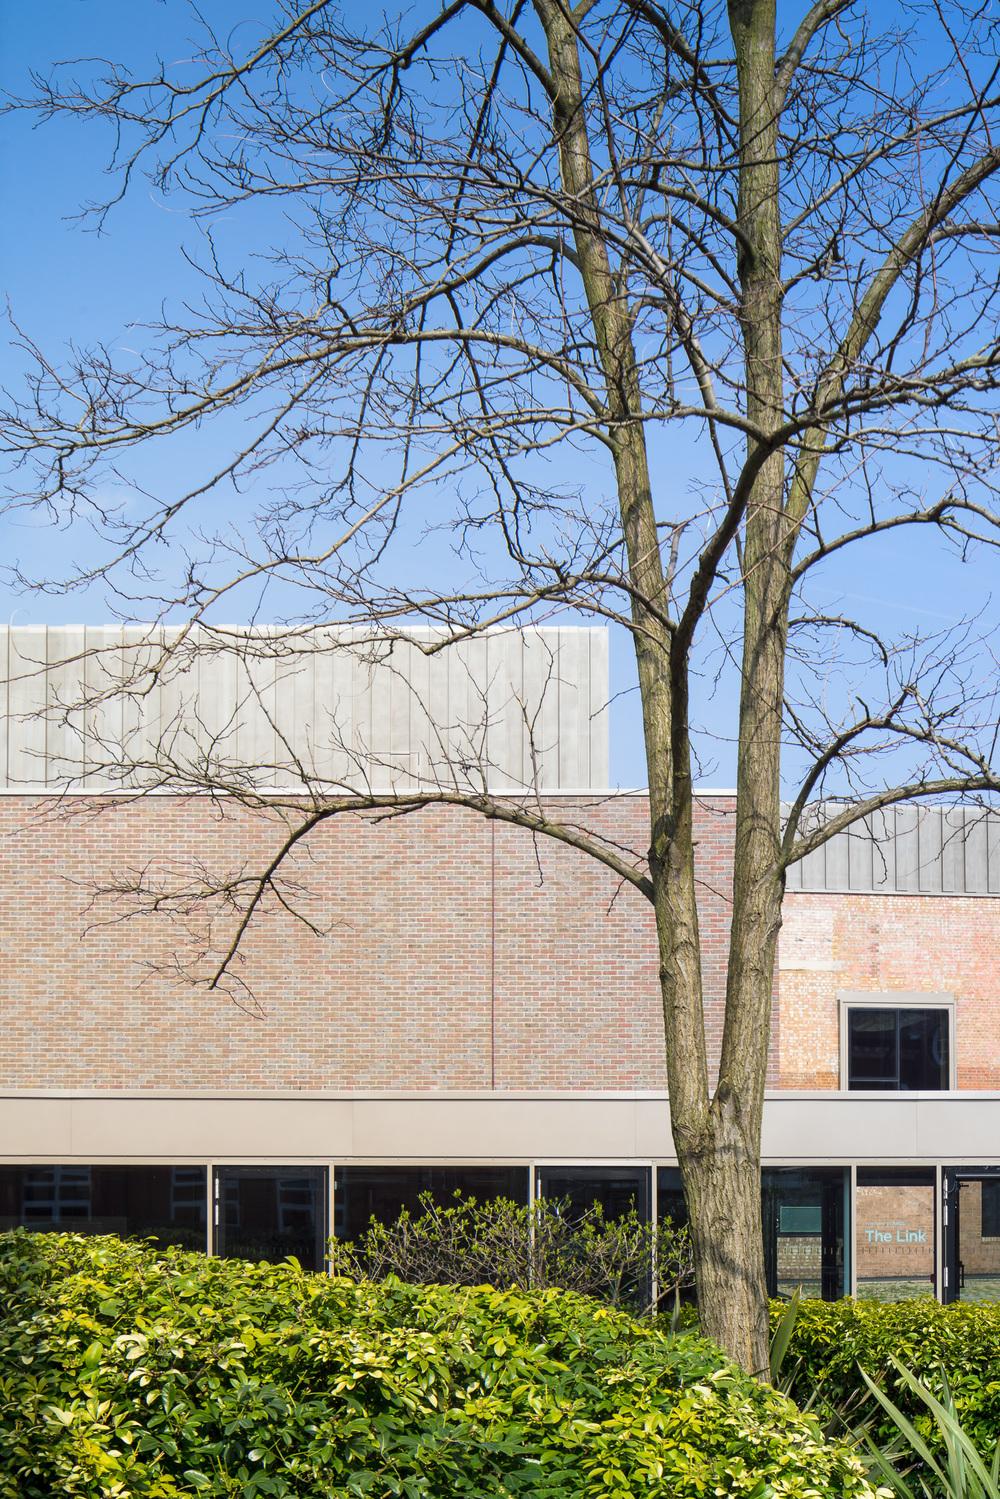 duggan-morris-RACC-mark-hadden-amsterdam-architecture-photographer-architectuurfotograaf-016.jpg